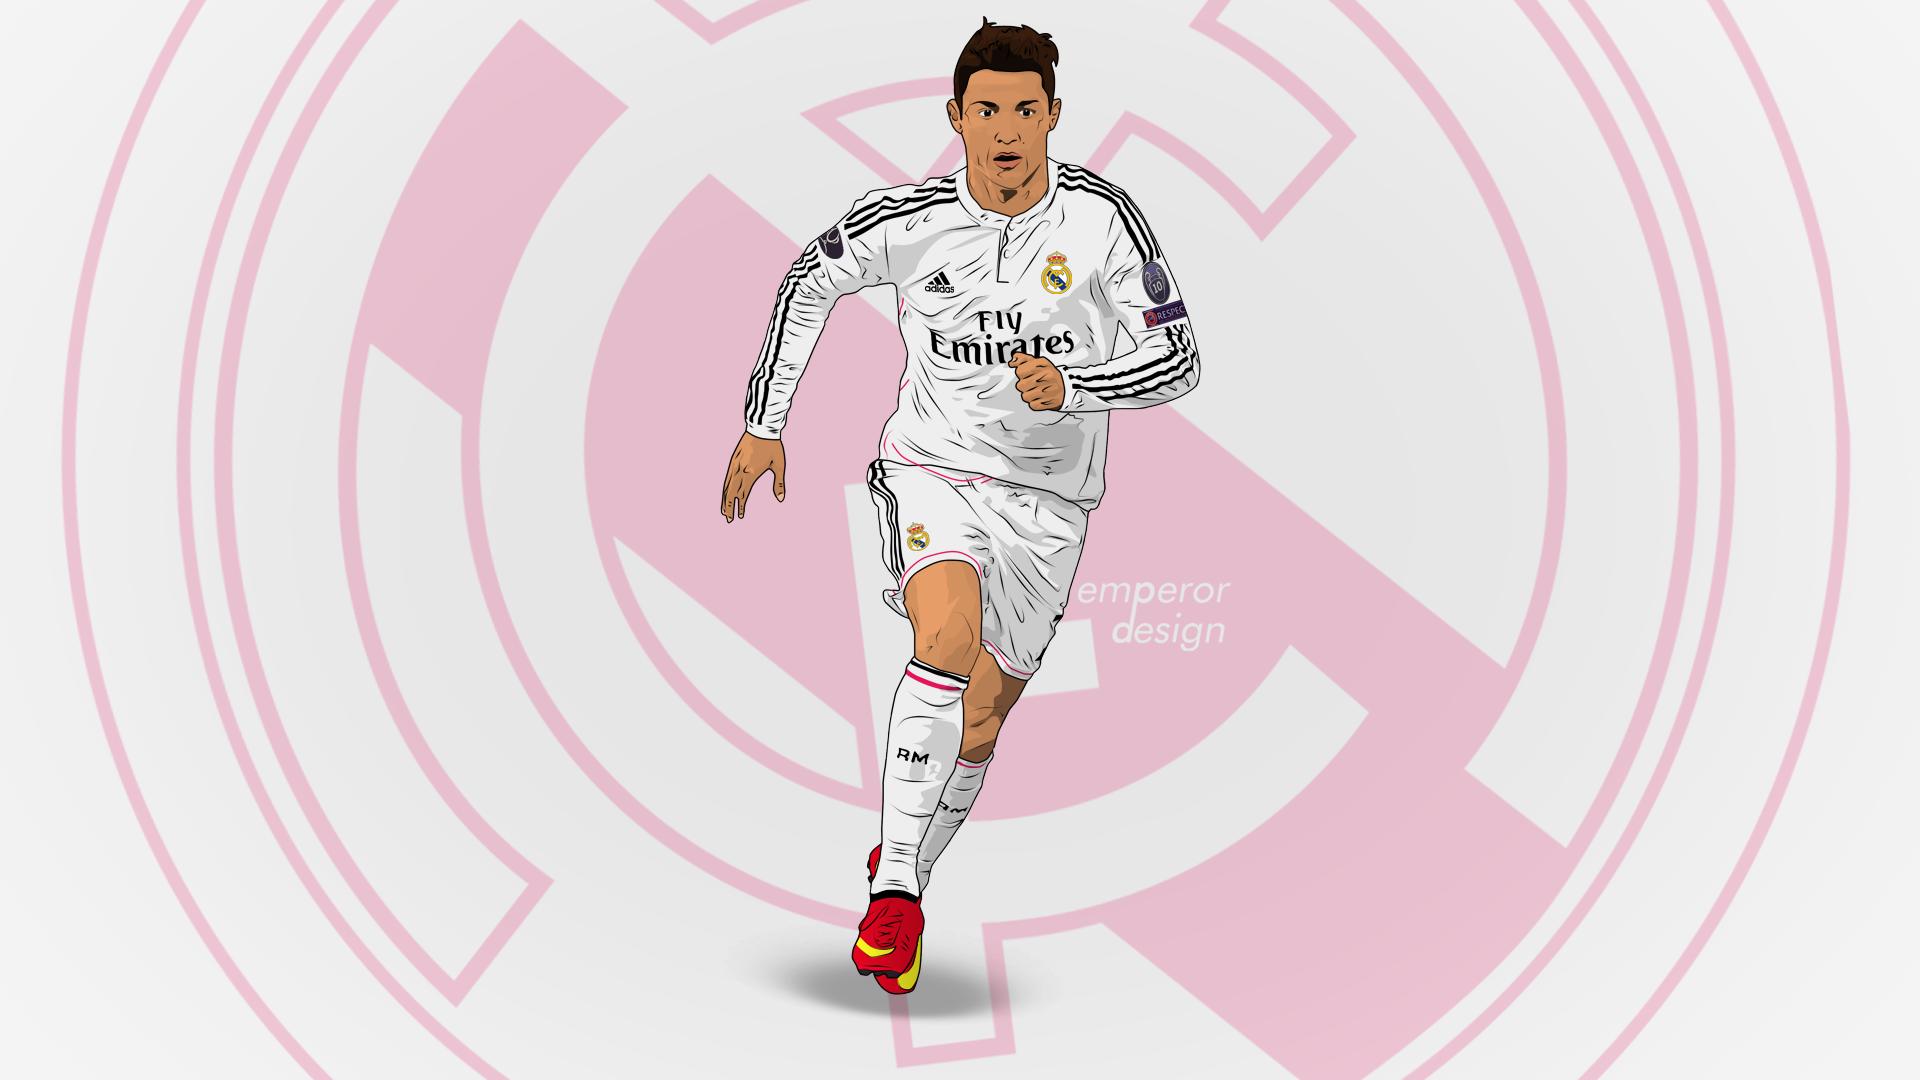 Wallpapers Real Madrid 2015 Deviantart - Wallpaper Cave